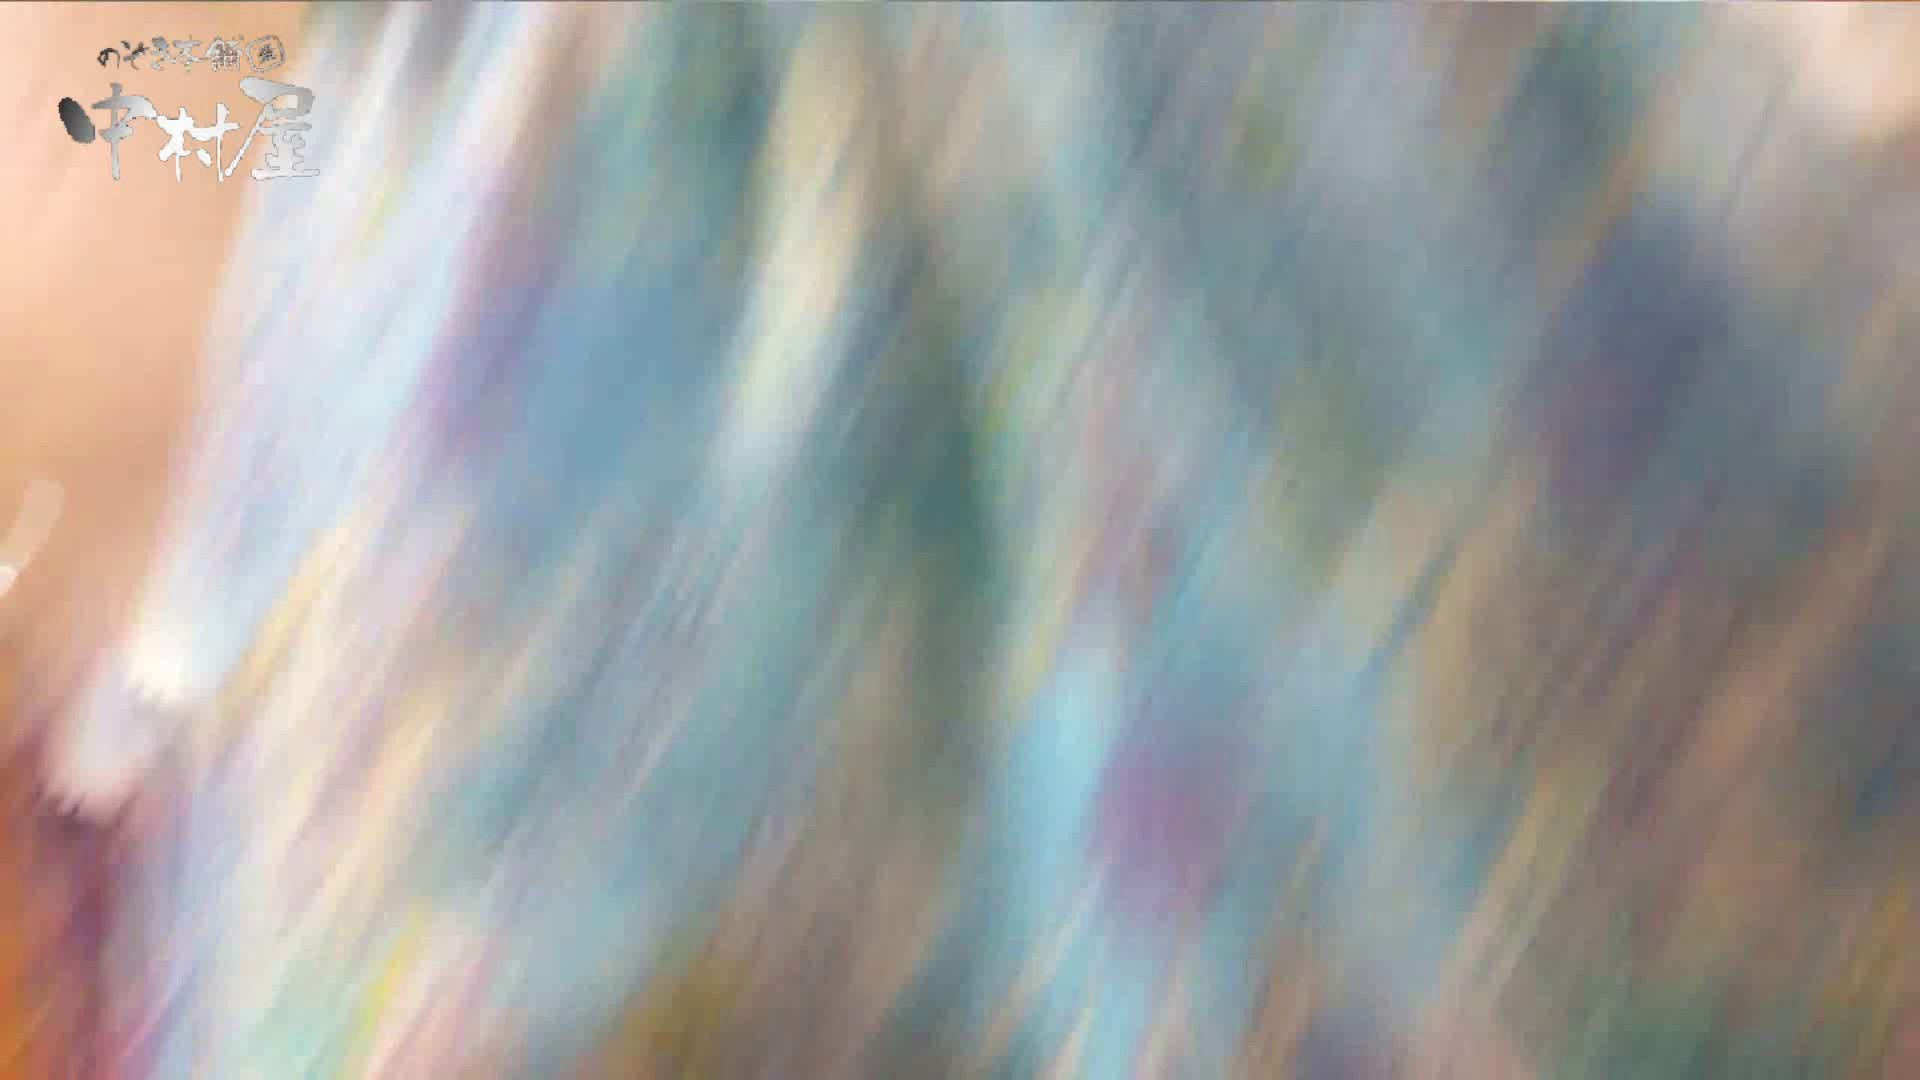 vol.43 可愛いカリスマ店員限定‼胸チラ&パンチラ 美脚おねーさんの胸元ゲット! 接写 | 胸チラ  76PIX 25